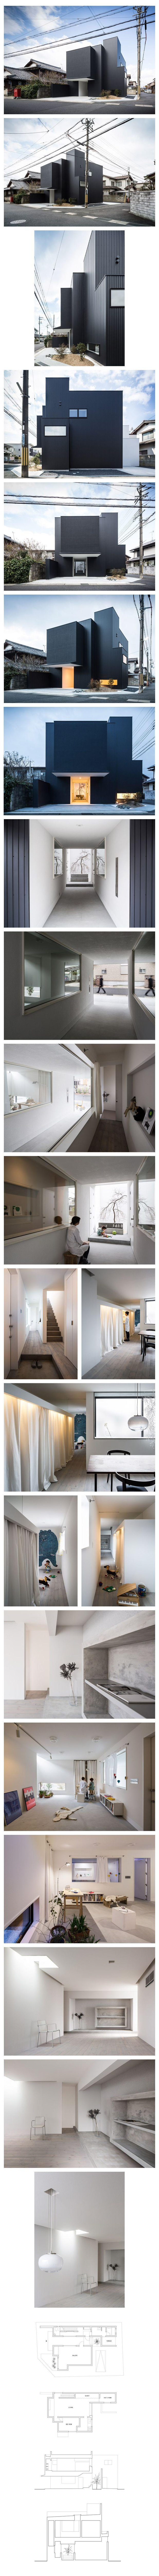 Kouichi Kimura's Framing House combines a home and a gallery | by FORM/Kouichi Kimura Architects | Shiga, Japan @dezeen